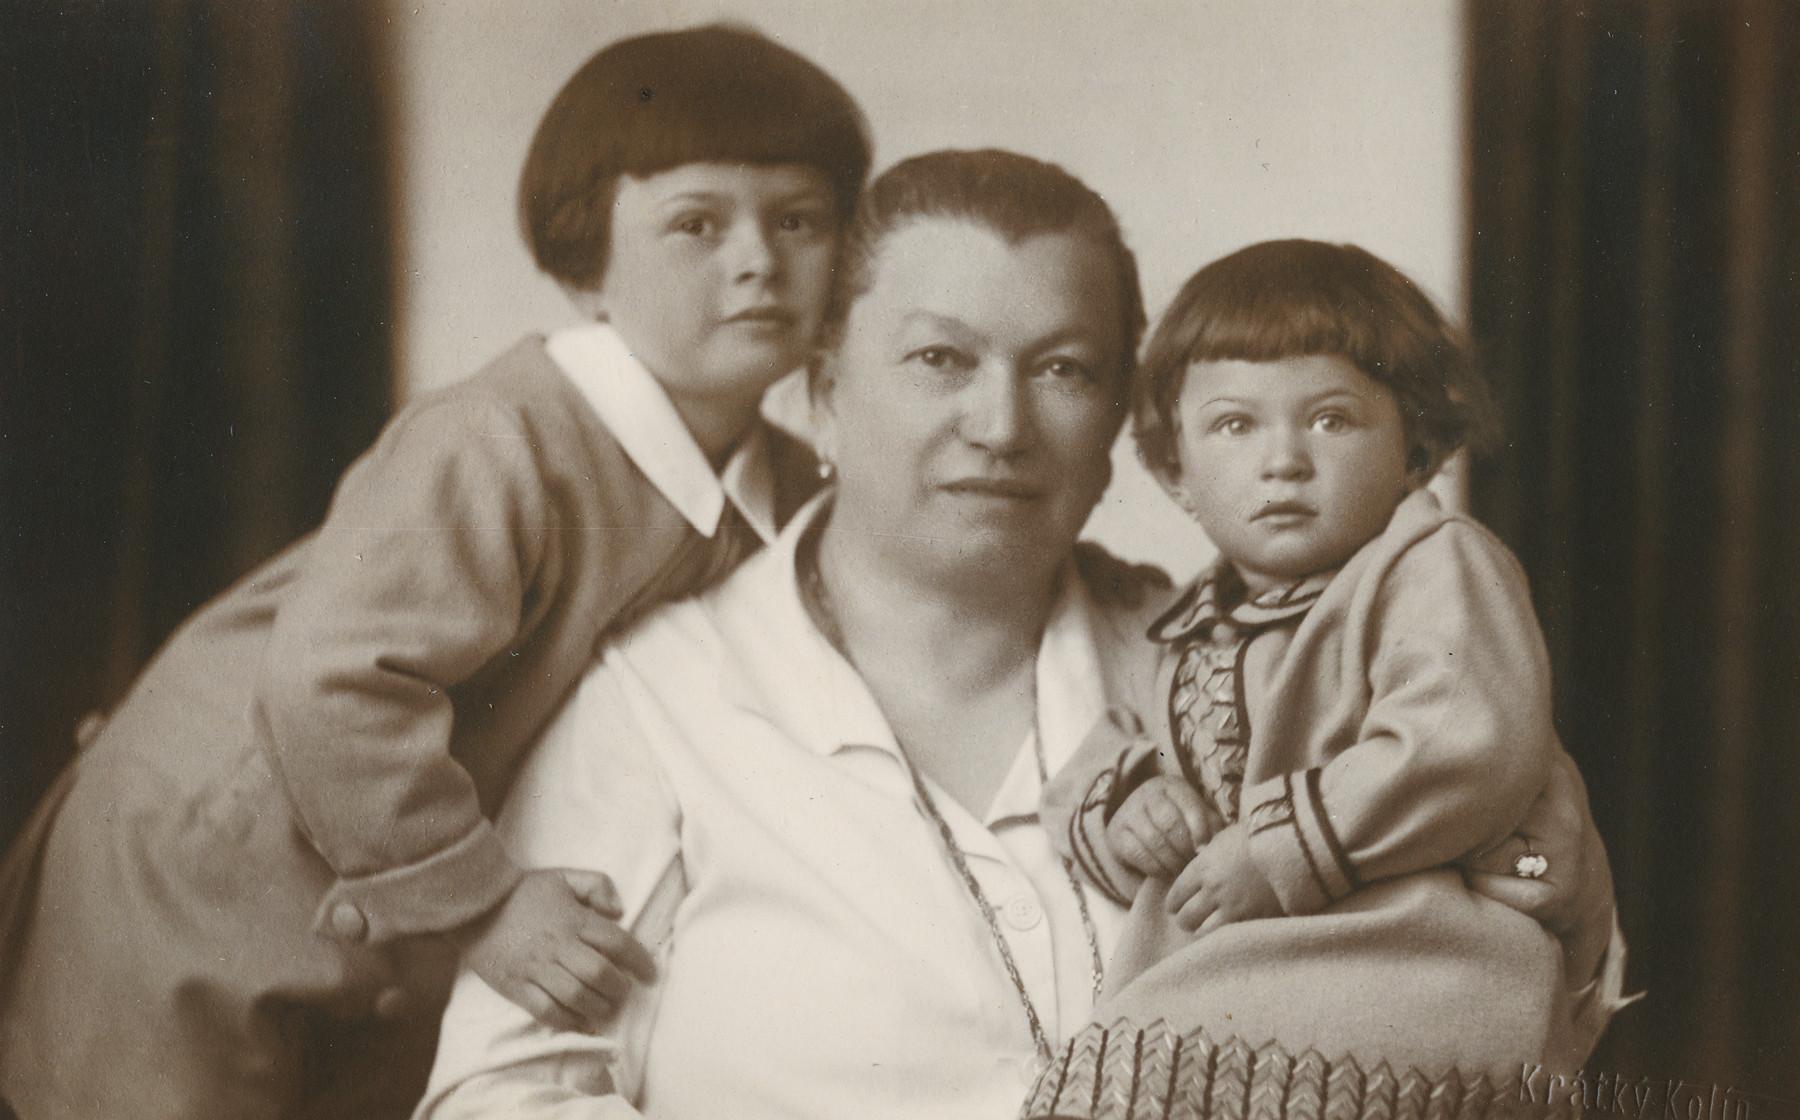 Studio portrait of  Irka (left )and Hana (right) Lustig with their grandmother Karla Heller